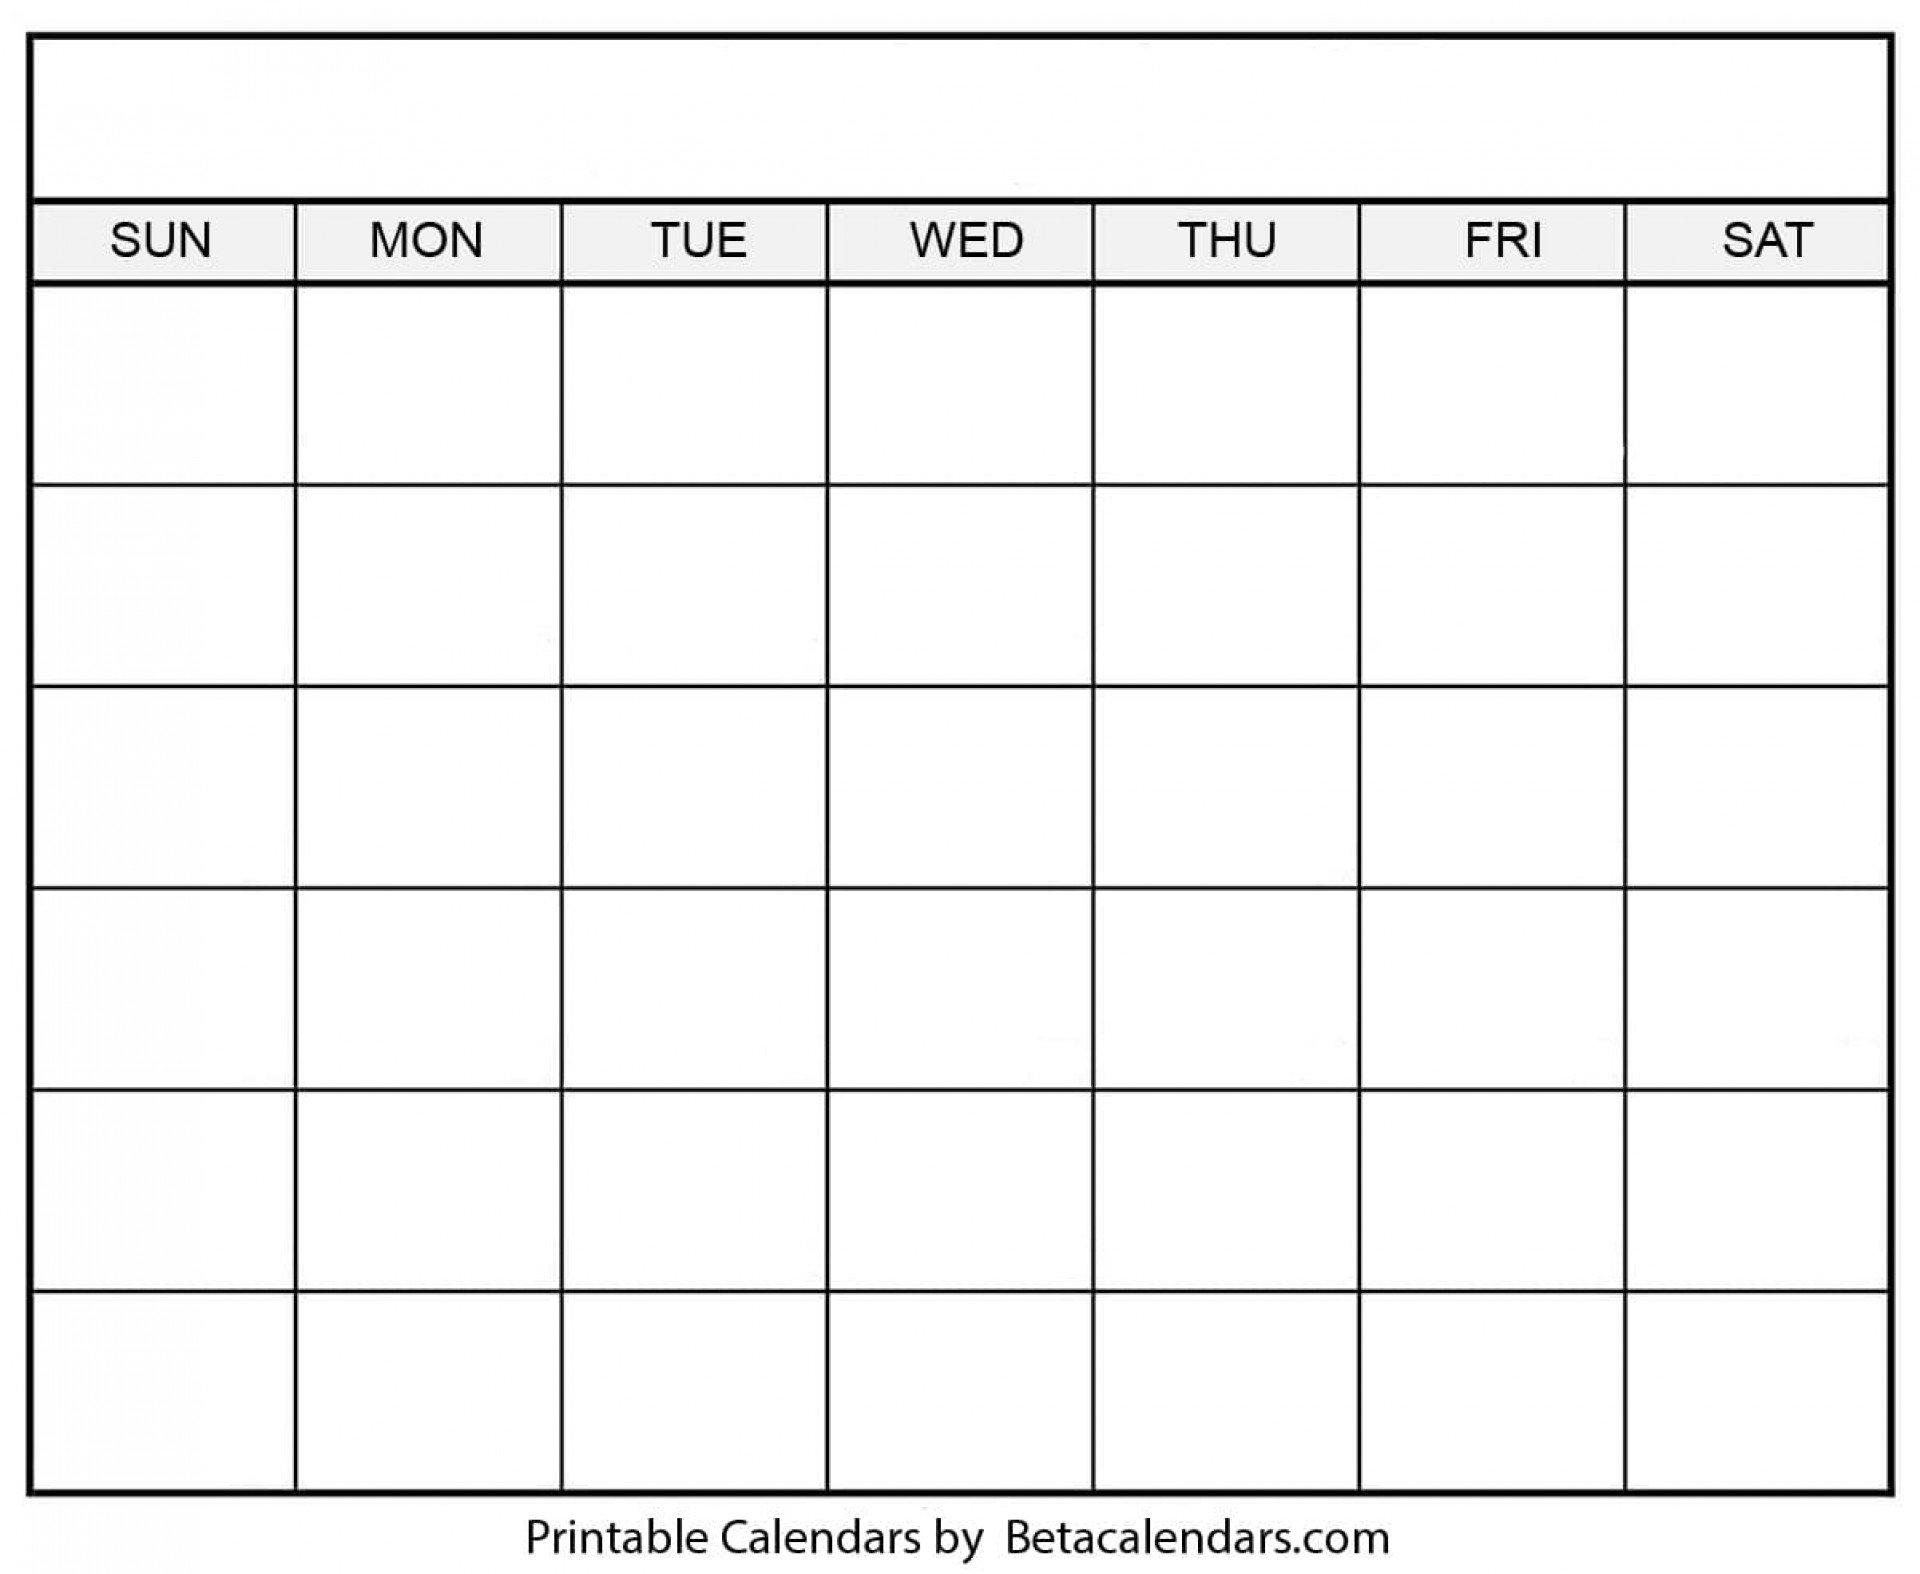 30 Day Blank Printable :-Free Calendar Template